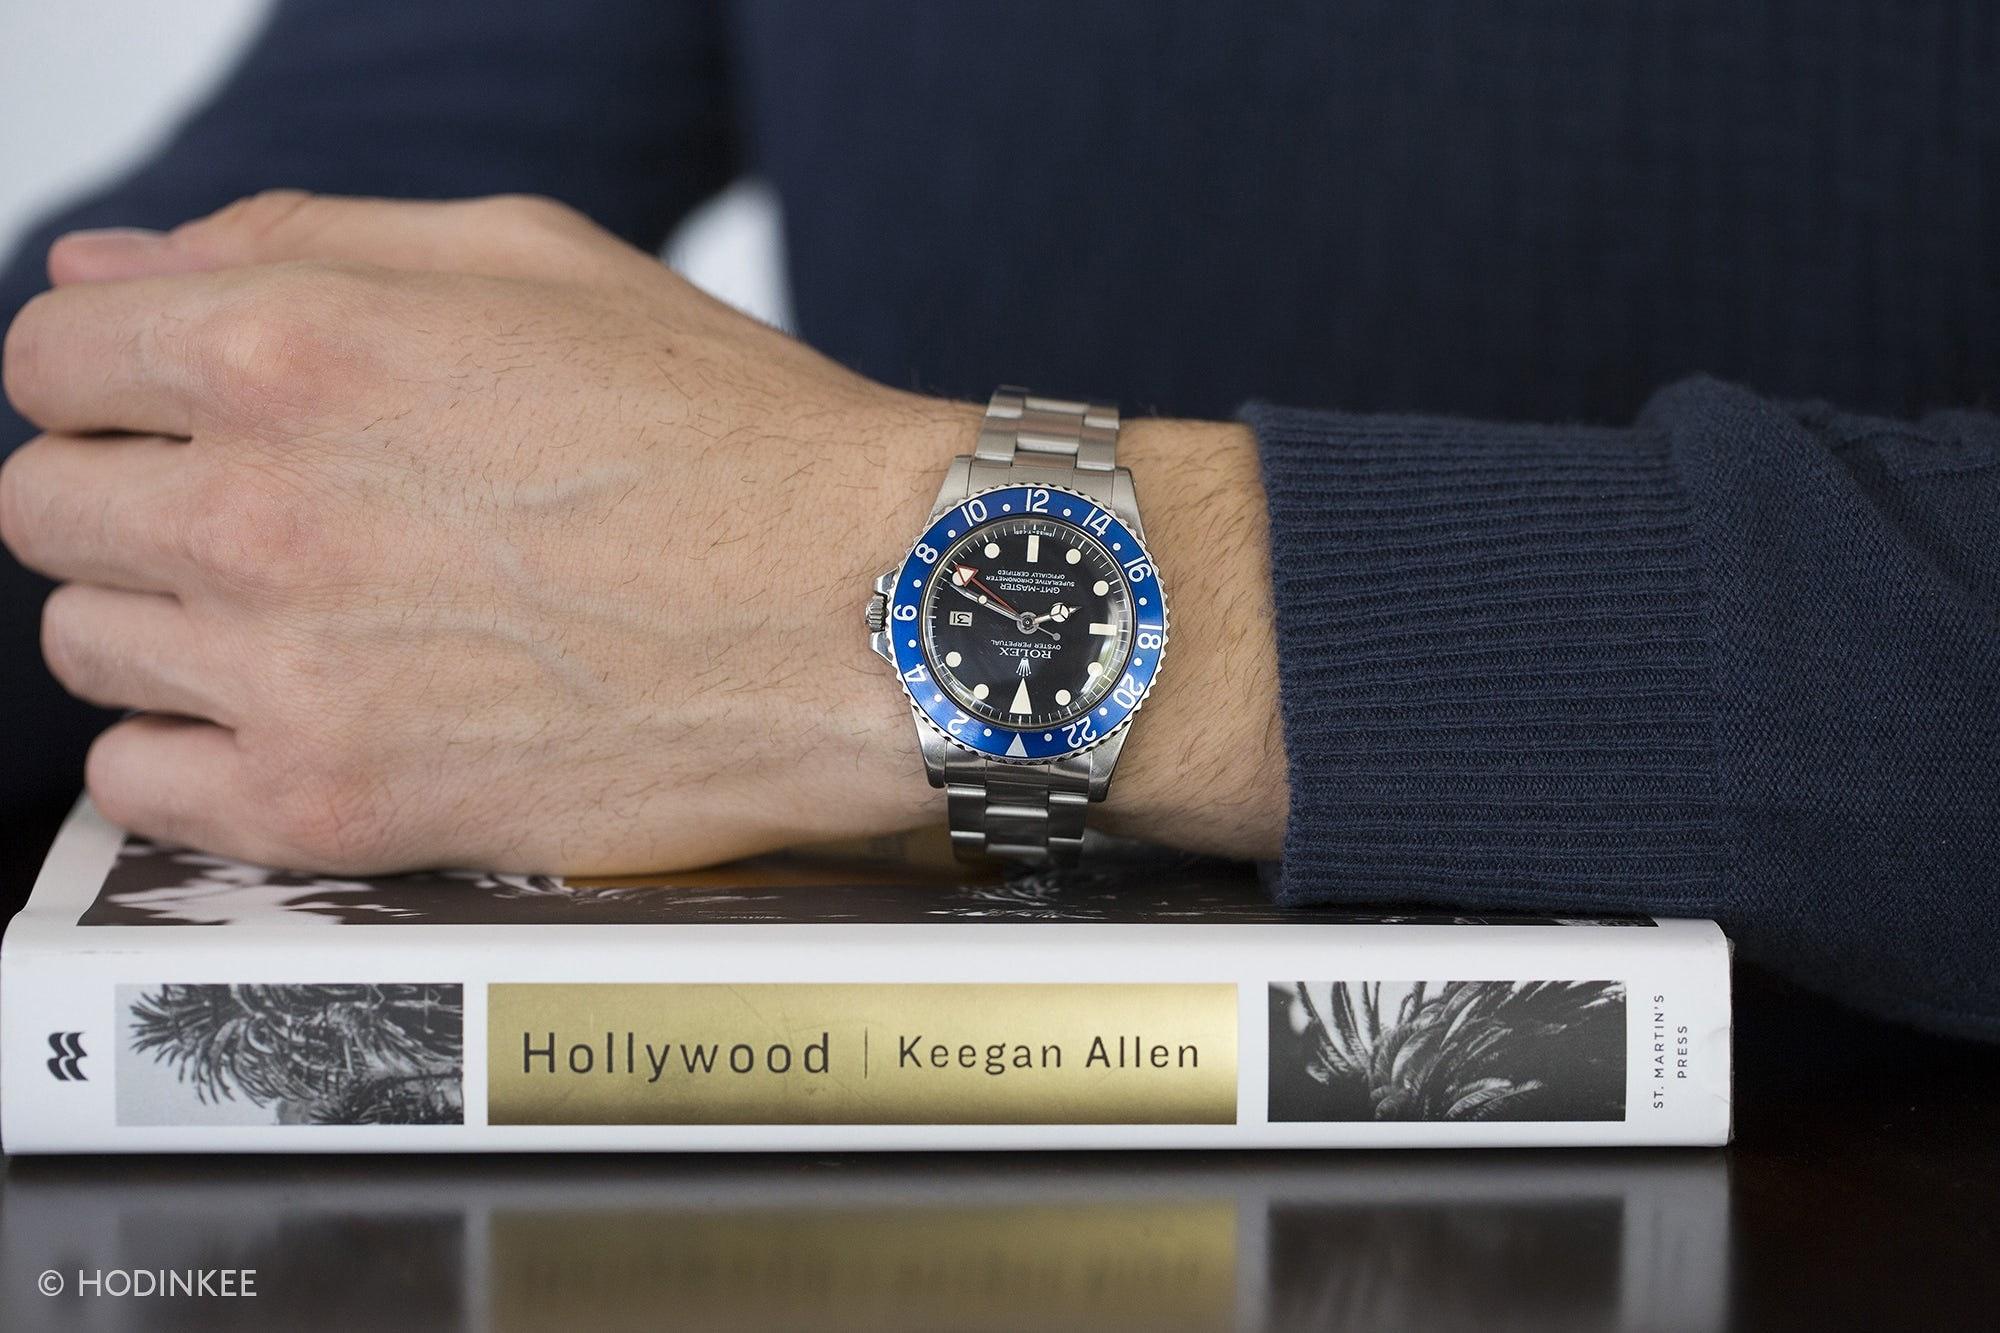 HODINKEE Radio: Episode 9: Keegan Allen wrist